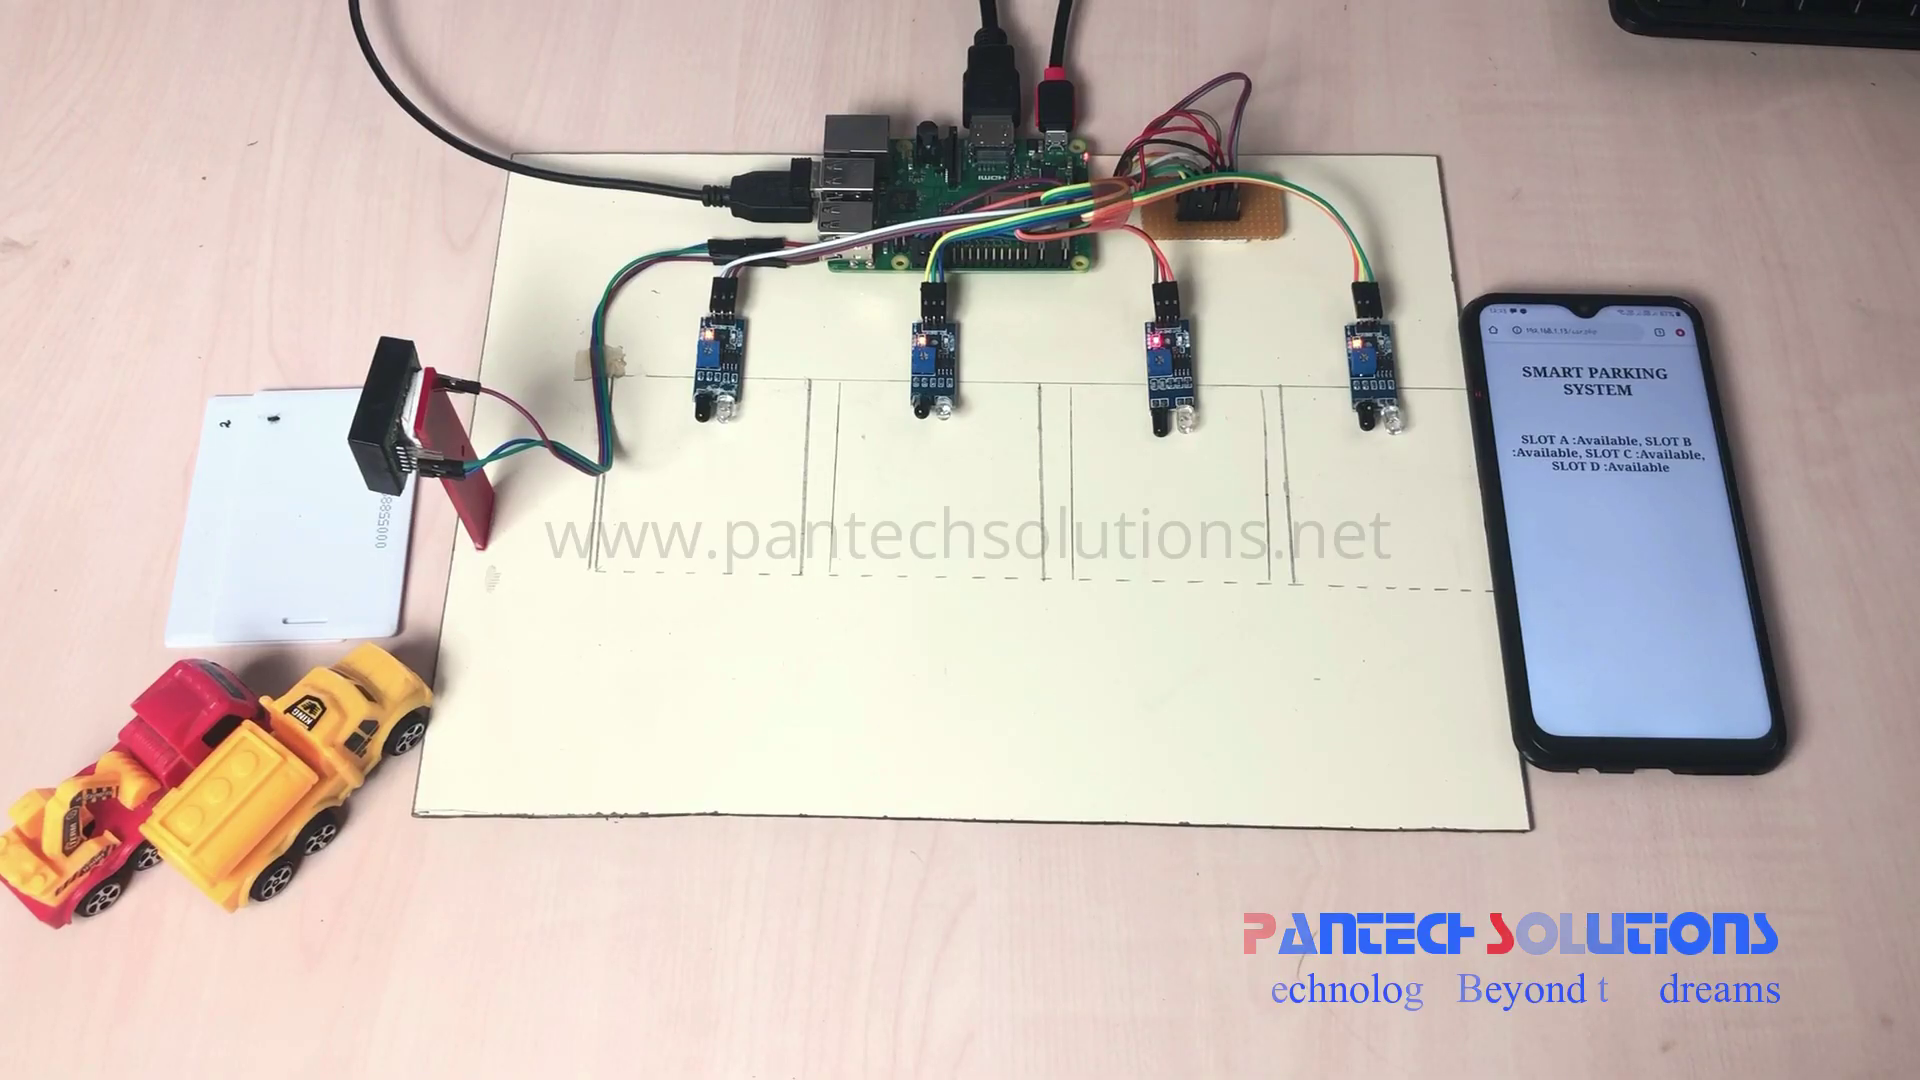 IoT Based Smart Parking System using Raspberry Pi